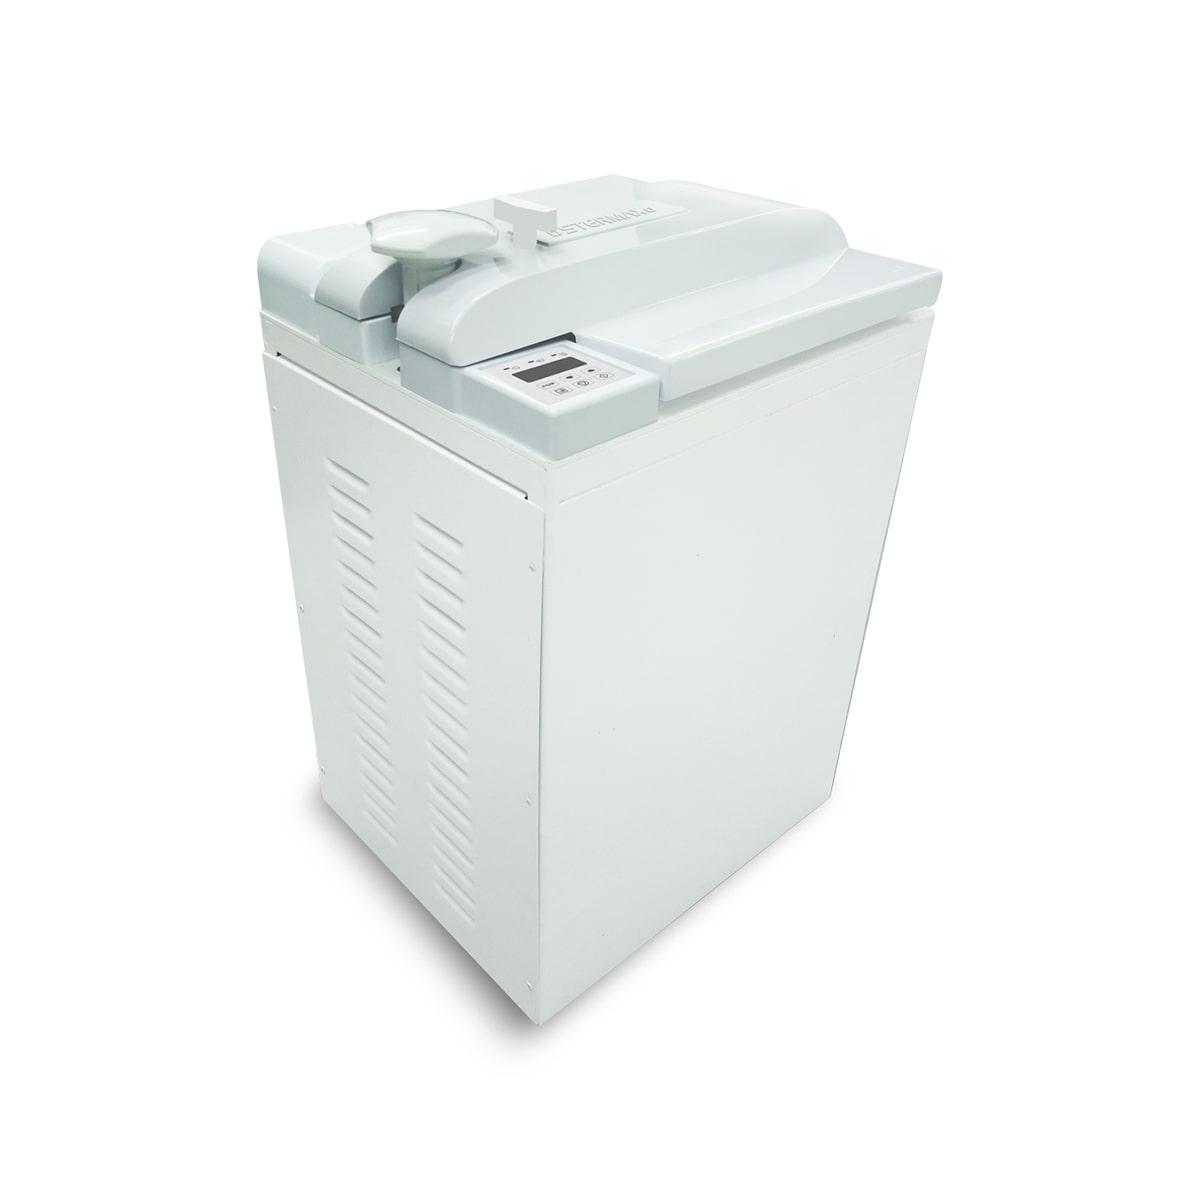 Autoclave Vertical Digital Gravitacional Normal Box 40 litros  Stermax